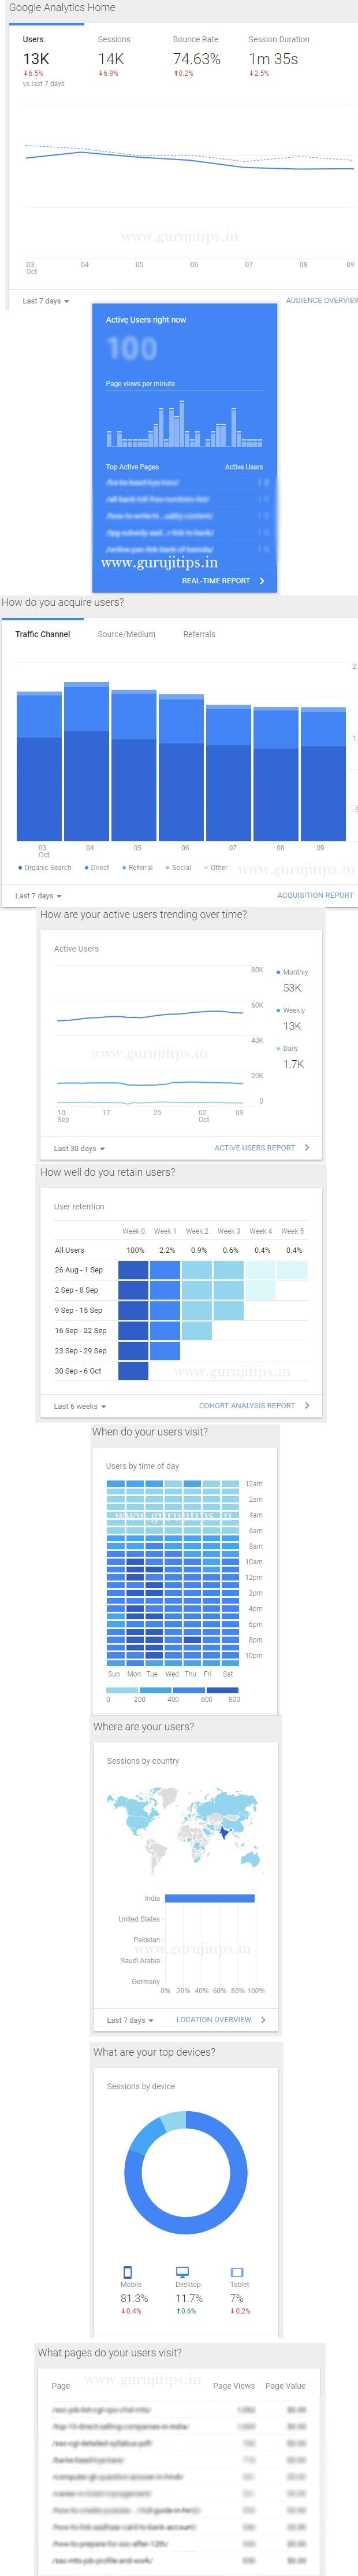 google analytic dashboard